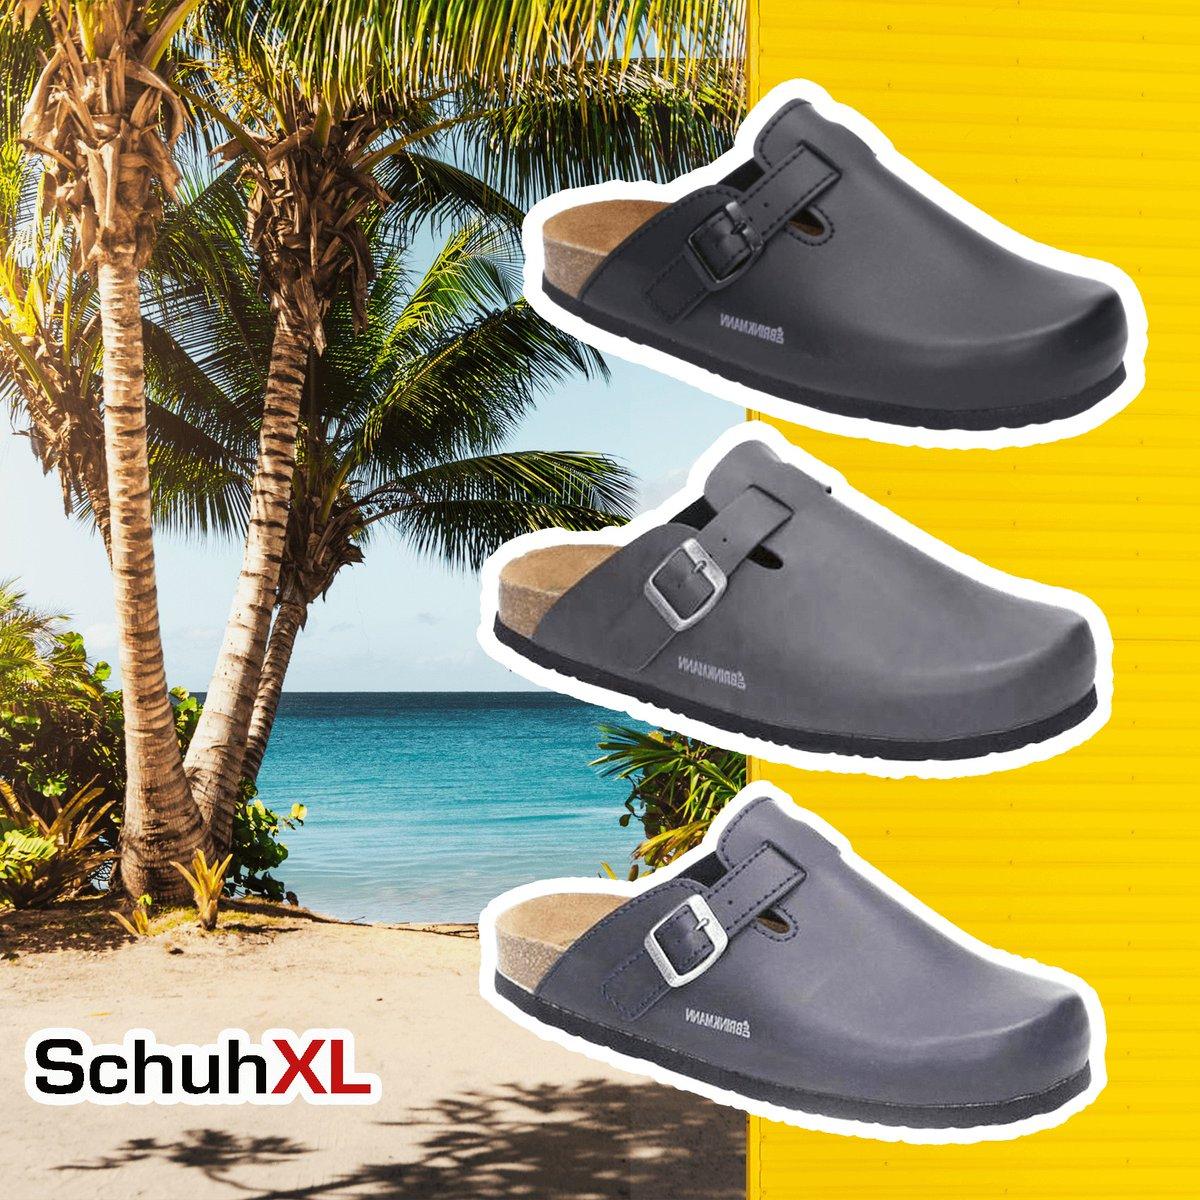 Schuhe Schuhxl In Xl Twitter On CxoderB